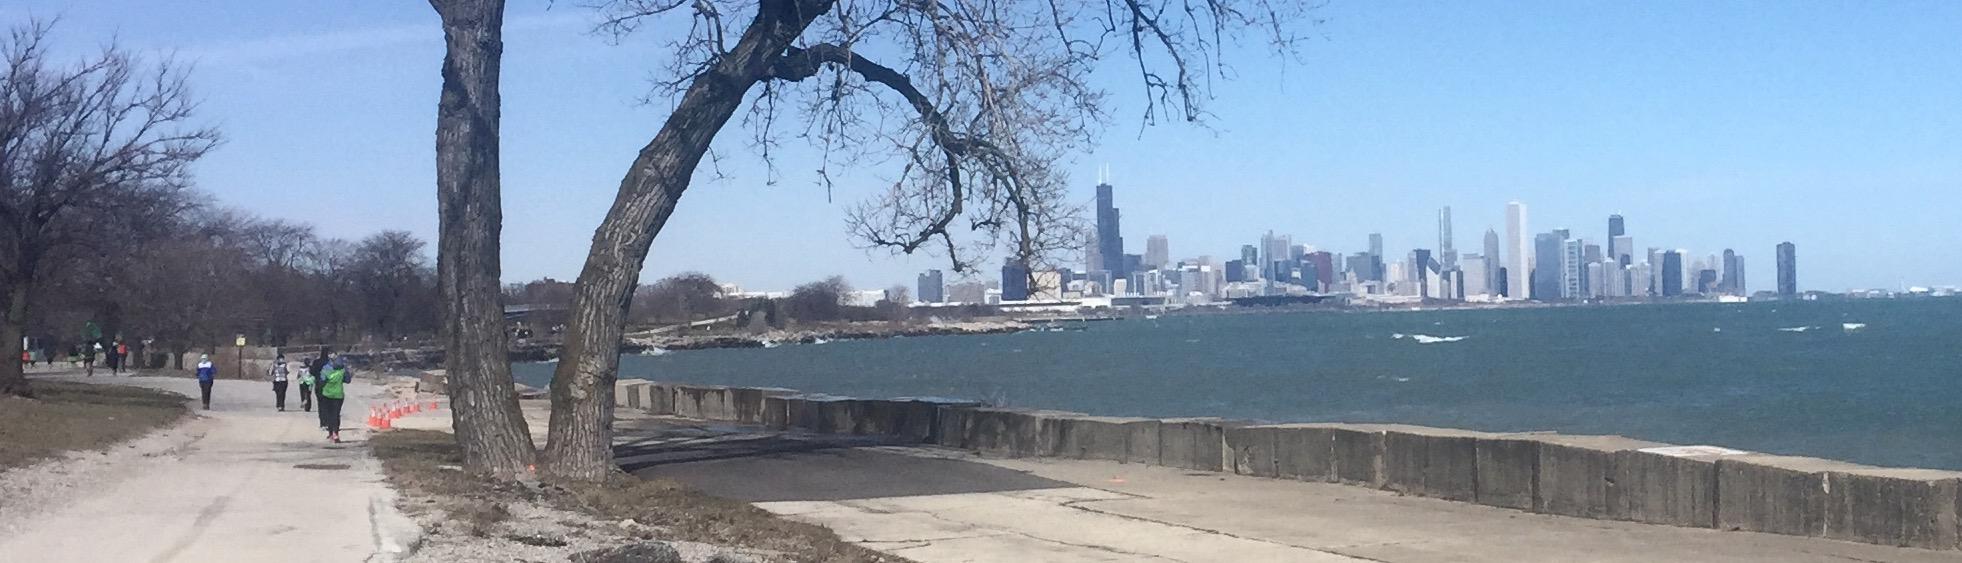 Chicago Get Lucky Half (2)